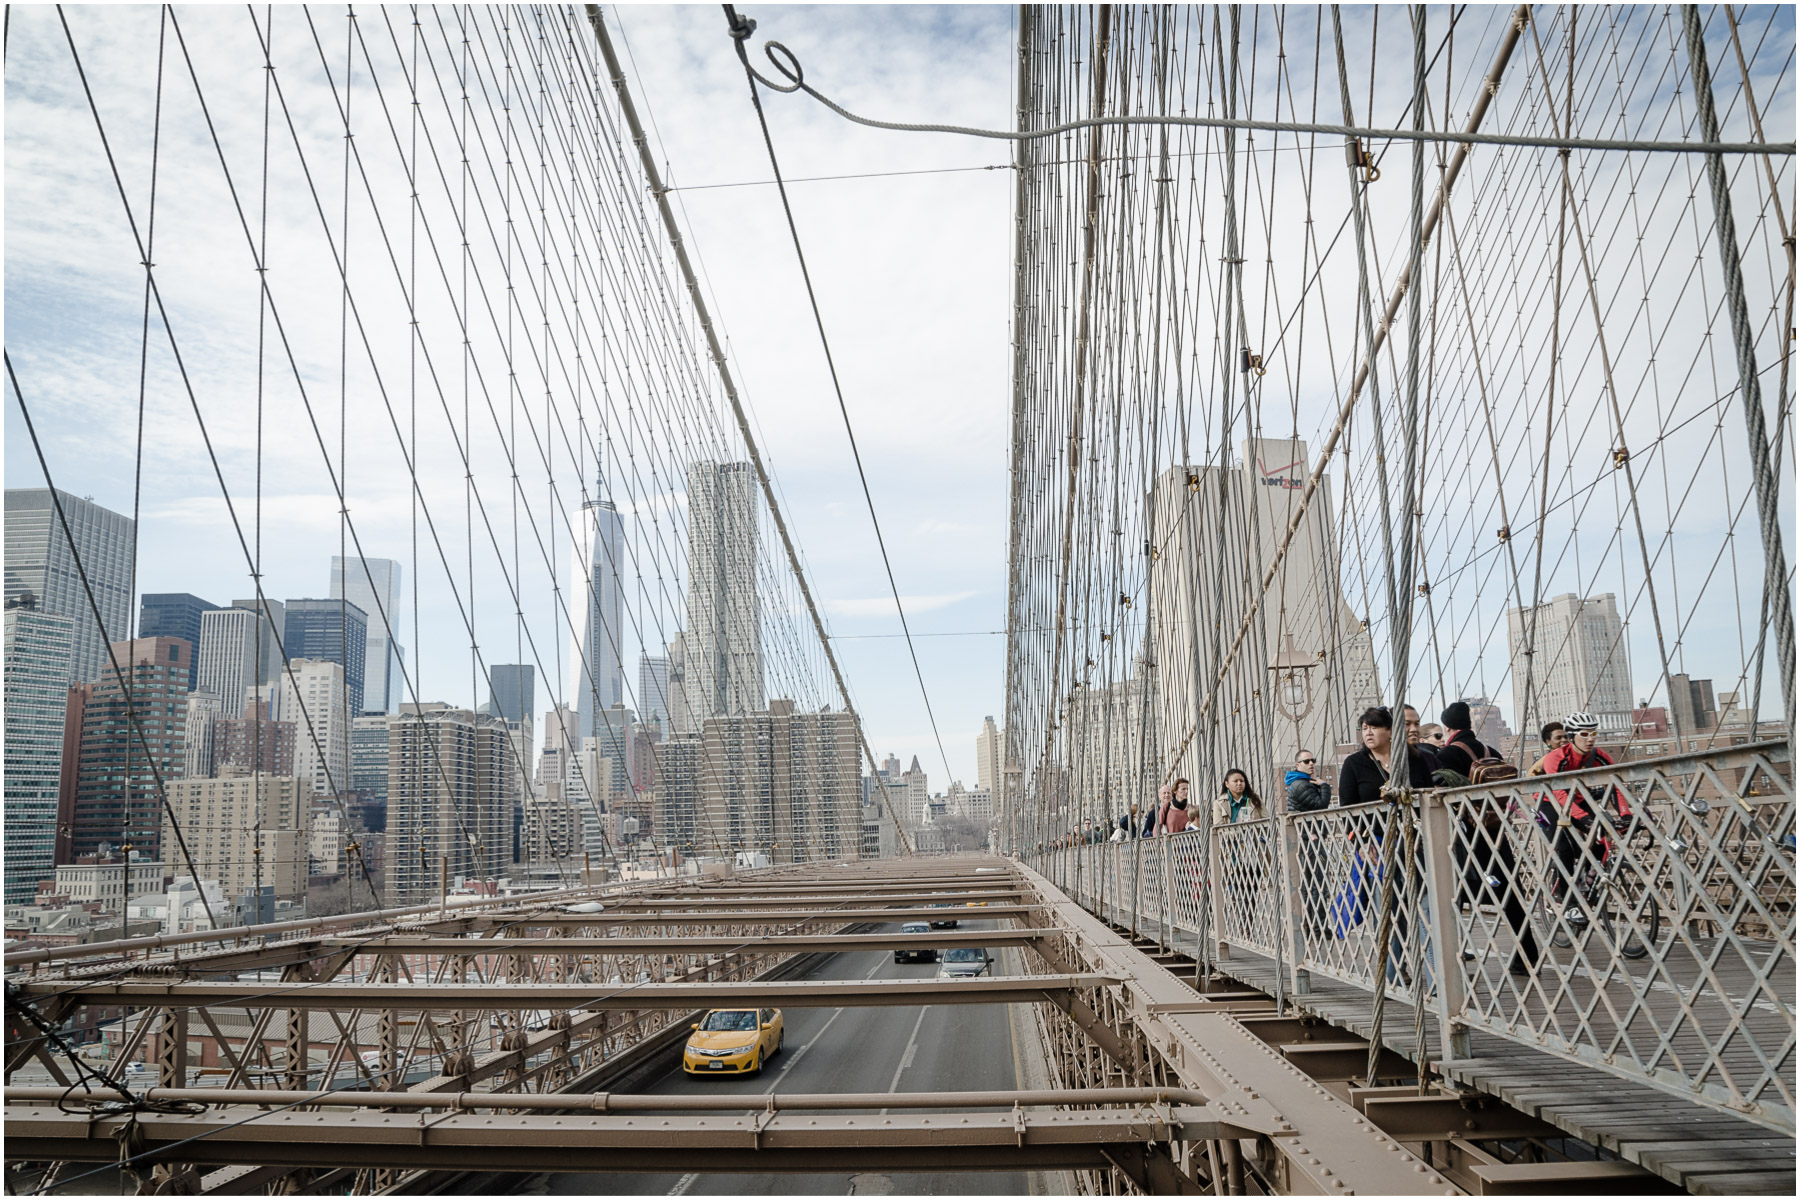 Crossing-the-Brooklyn-Bridge_2.jpg